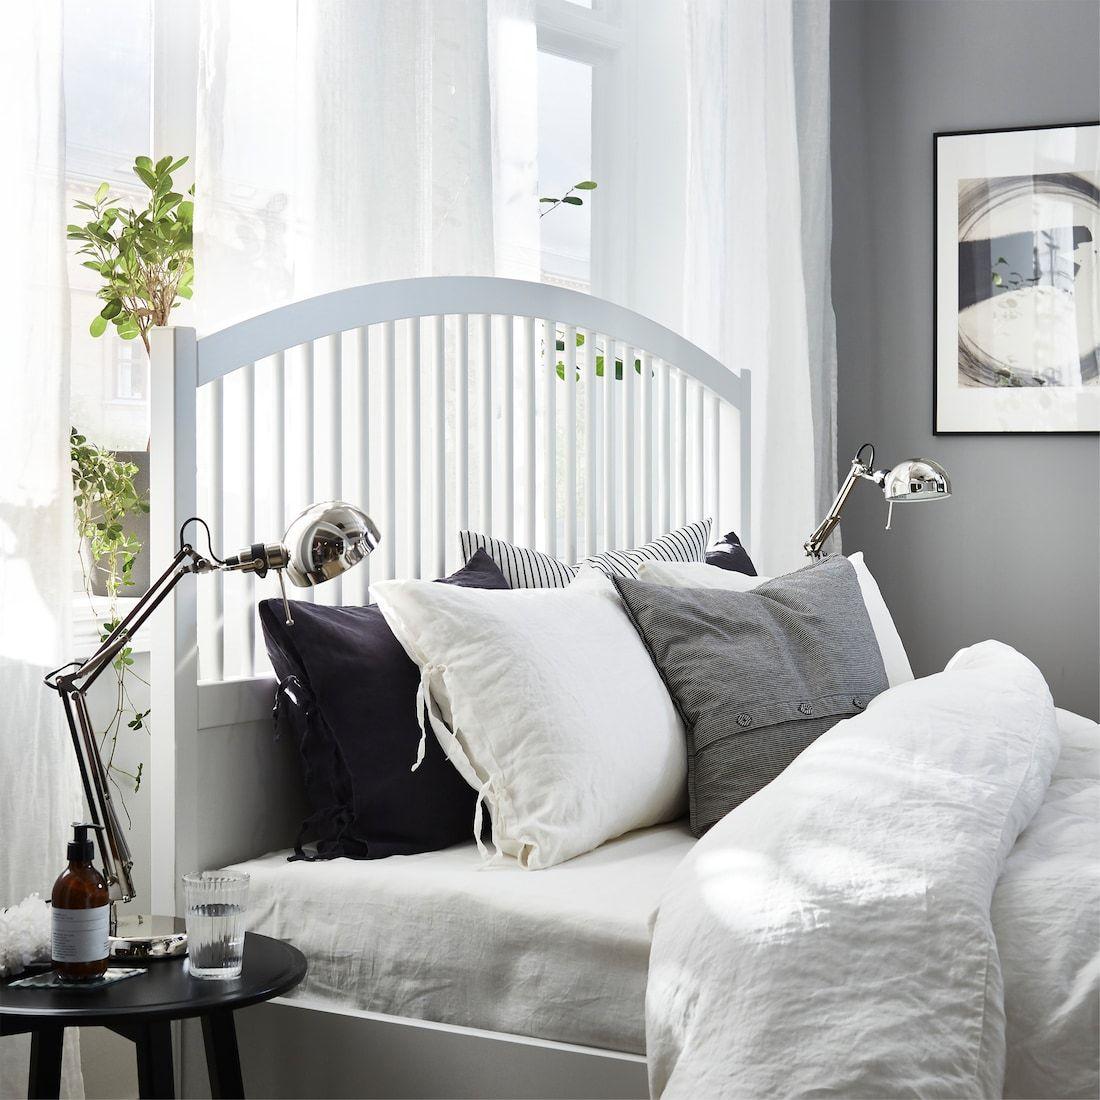 Pax Tyssedal Un Guardaroba Ricco Di Stile In 2020 Ikea Pax Ikea Bedroom Furniture